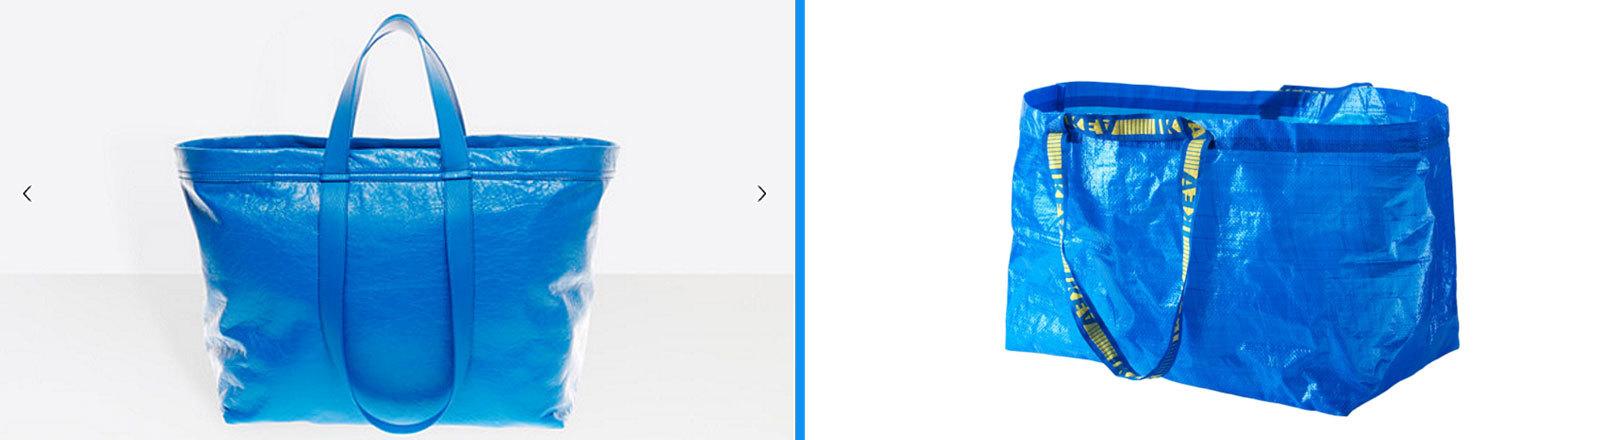 blaue Balenciaga-Tasche | blaue Ikea-Tasche